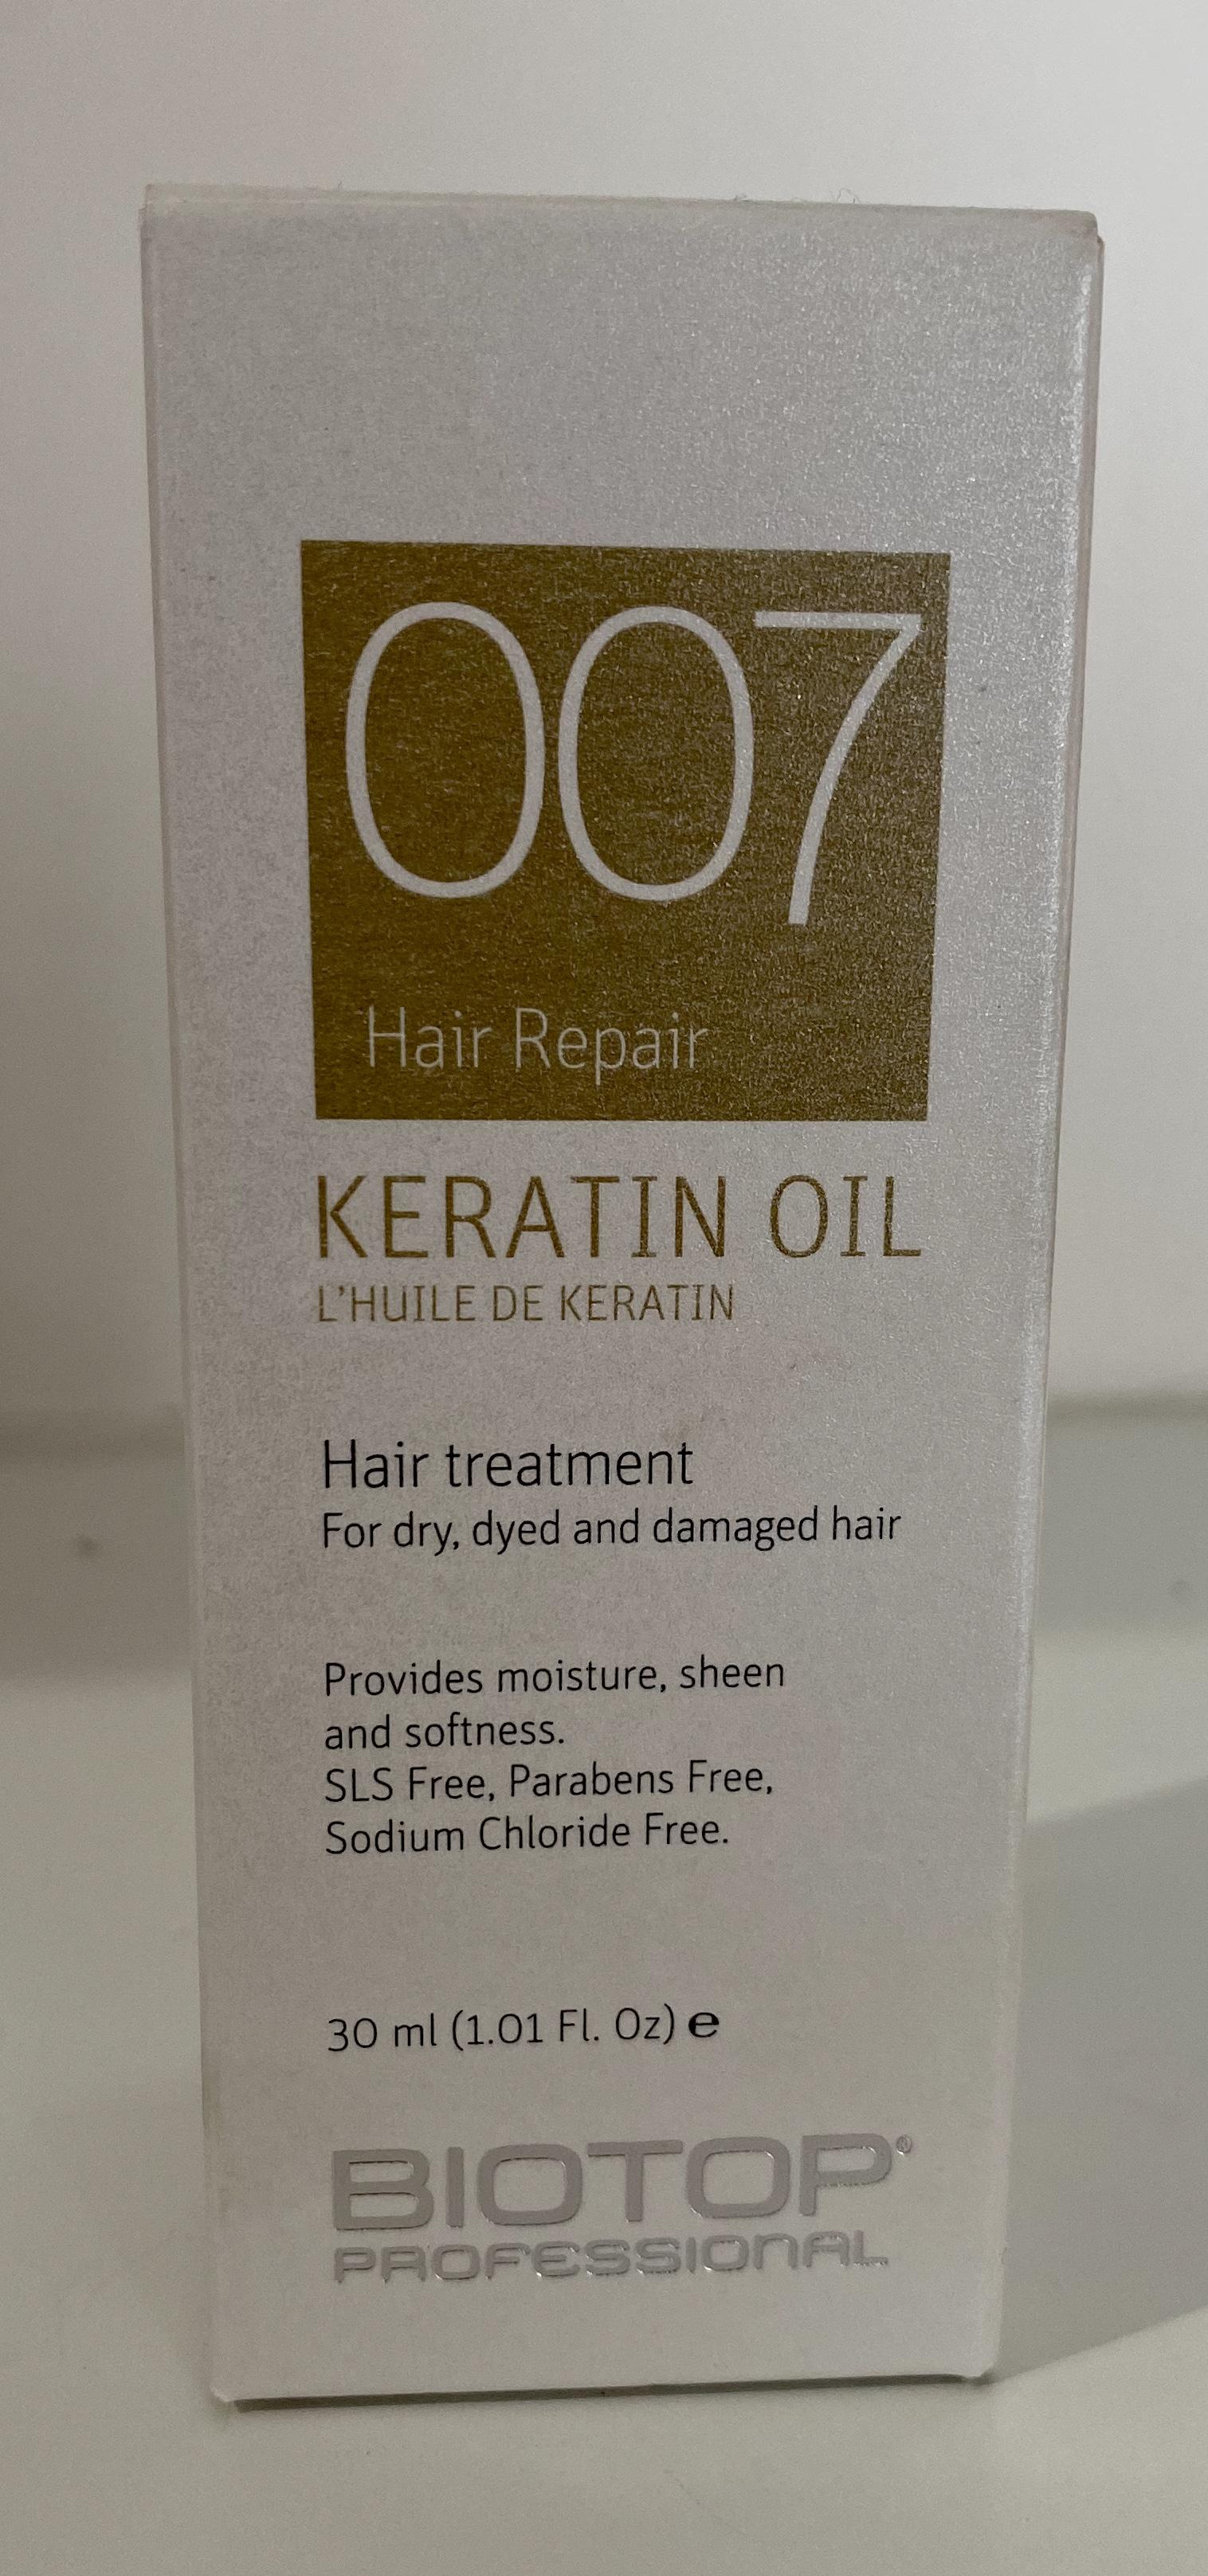 007 Keratin Oil Treatment